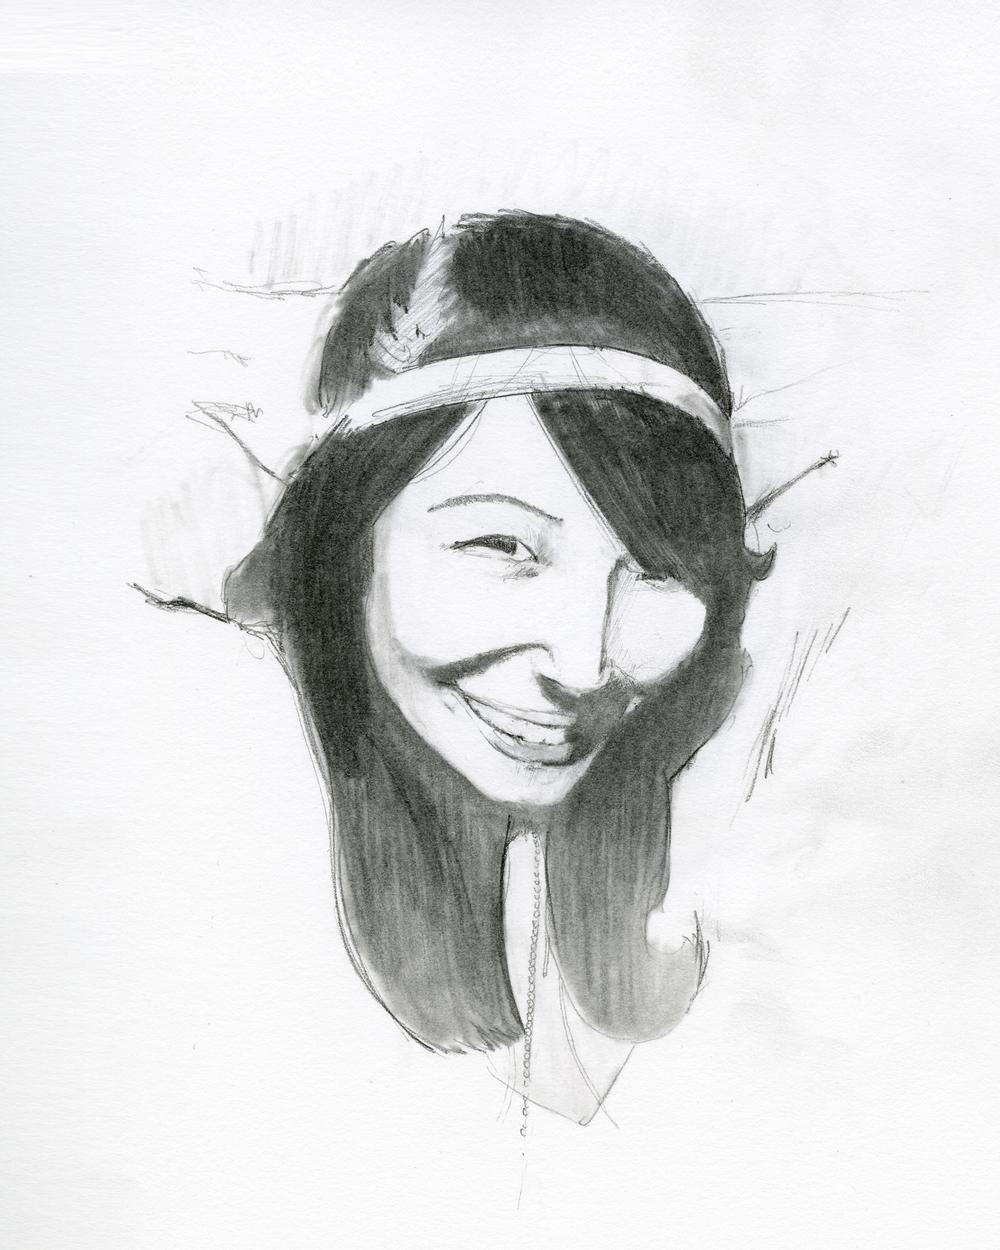 sketch-lilly_david-jackowski_alvatron-studio.jpg